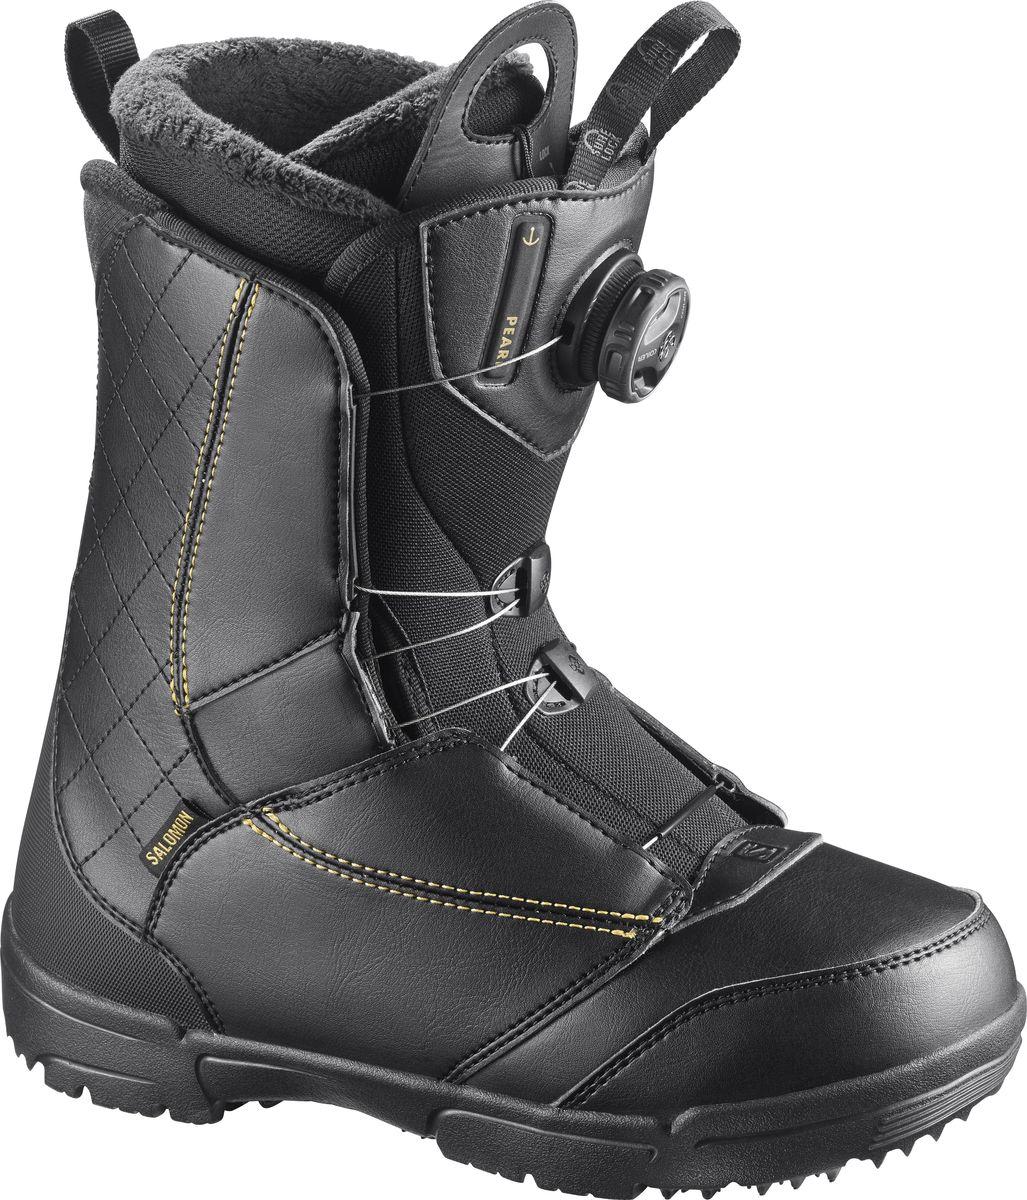 "Ботинки для сноуборда Salomon ""Pearl Boa"", цвет: черный, золотистый. Размер 26 (39,5)"